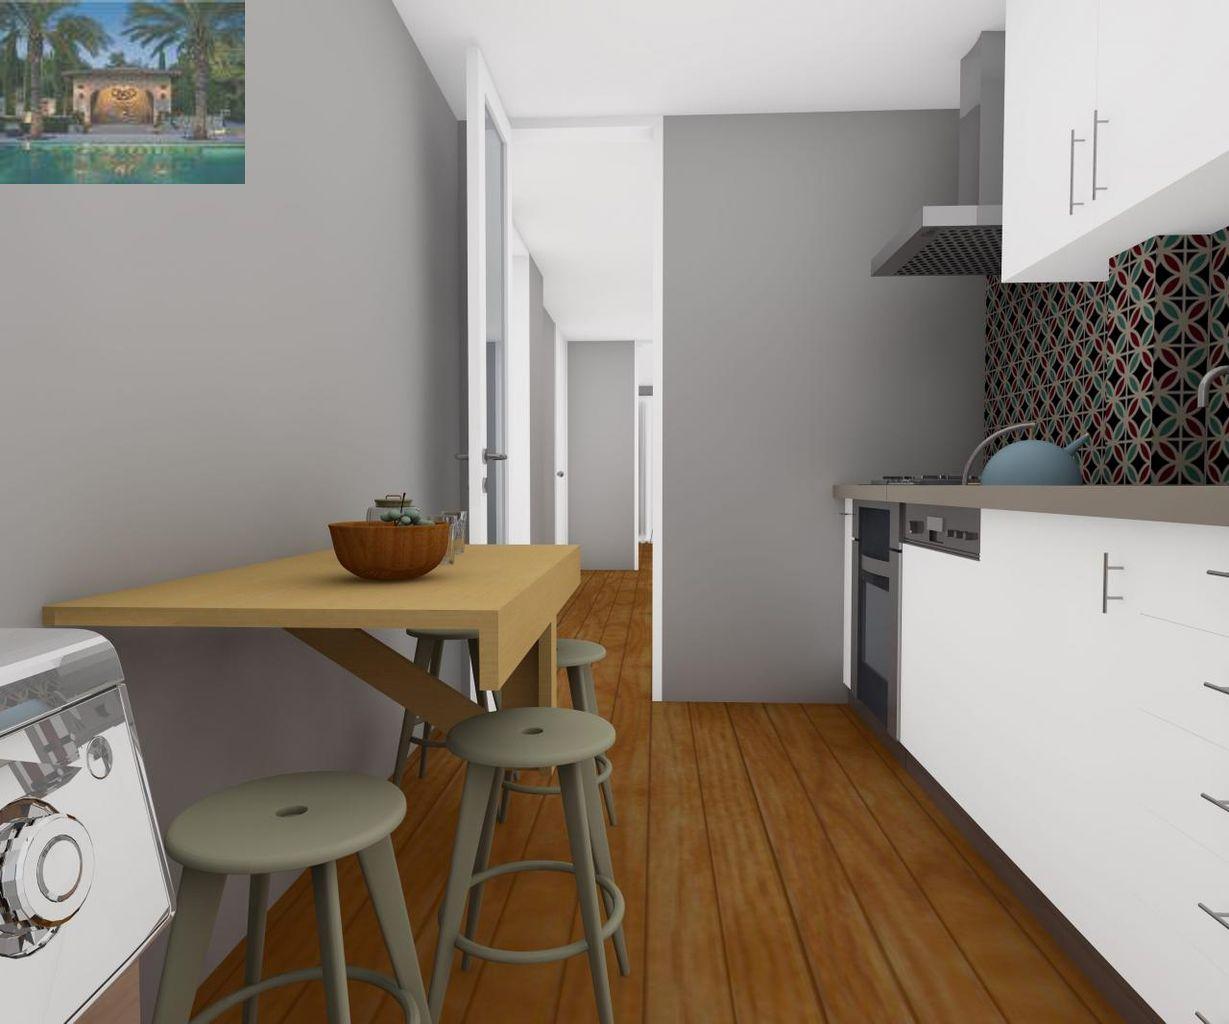 Benfica - Apartamento T3 totalmente remodelado